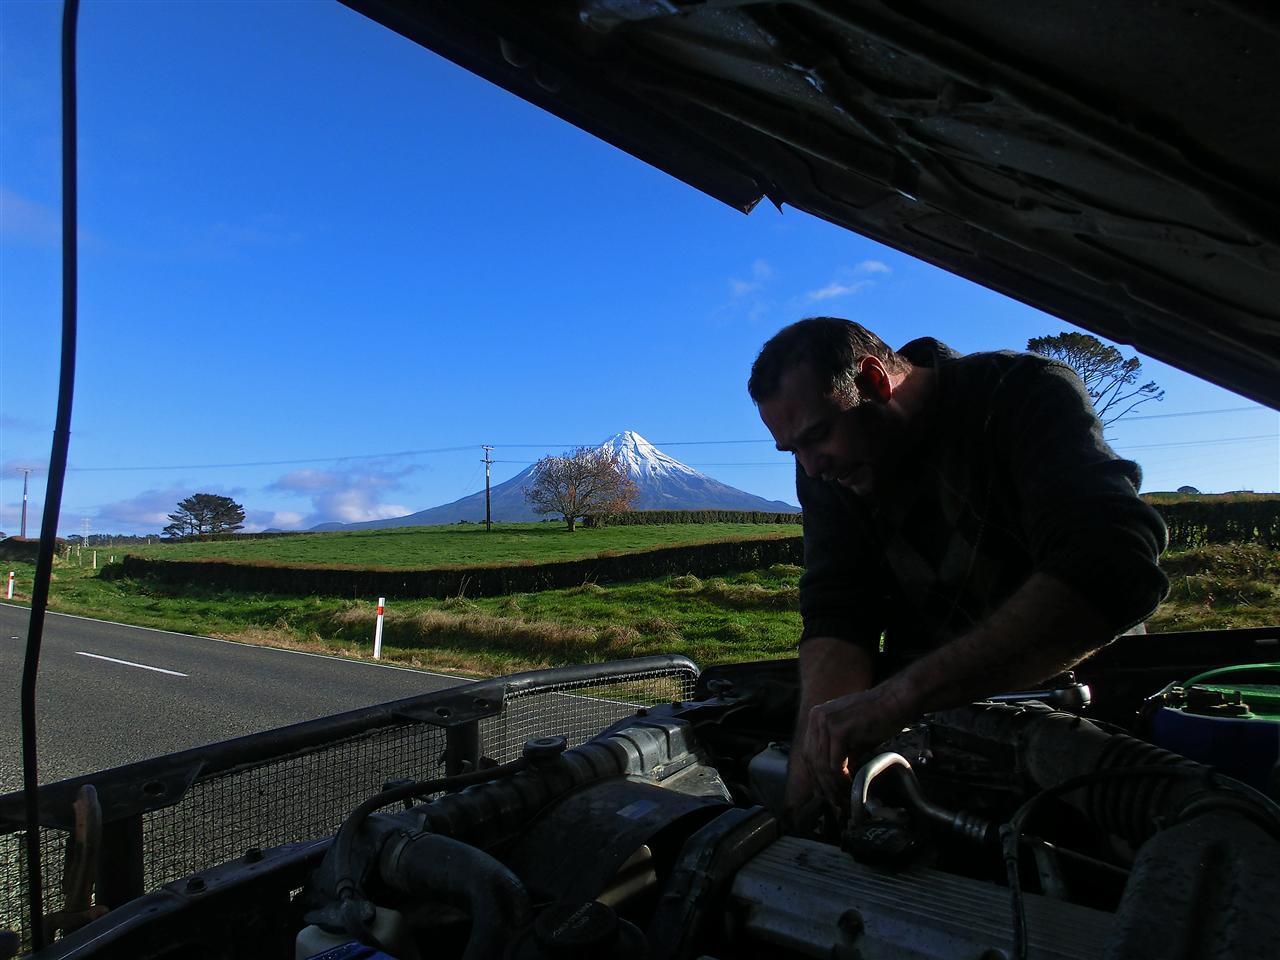 Keilriemen wechseln am Mount Taranaki (Neuseeland)